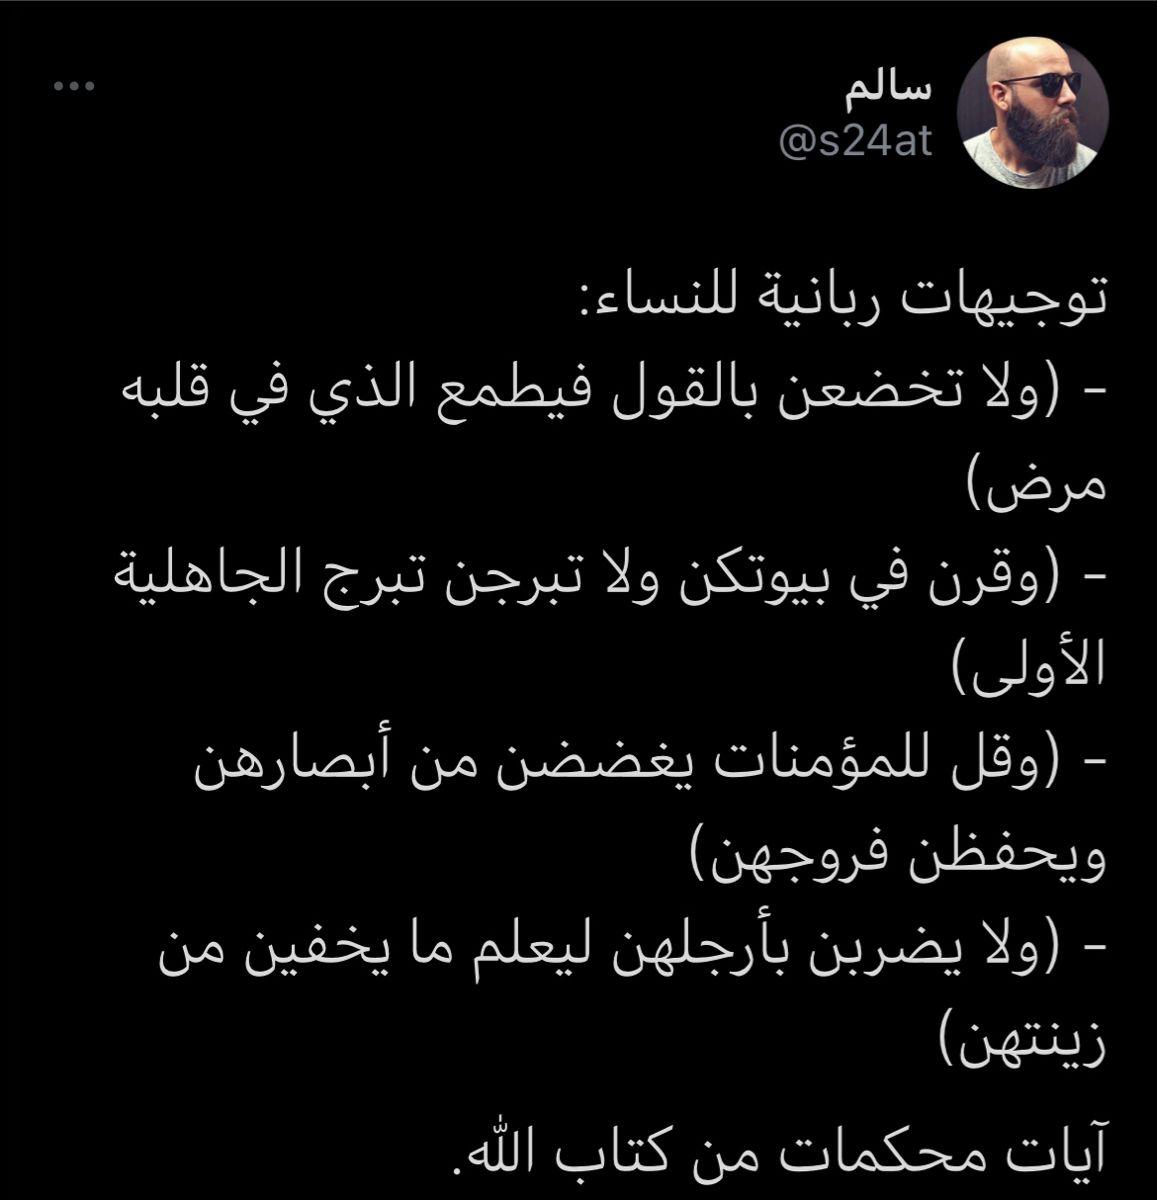 سالم On Twitter Arabic Calligraphy Calligraphy Arabic